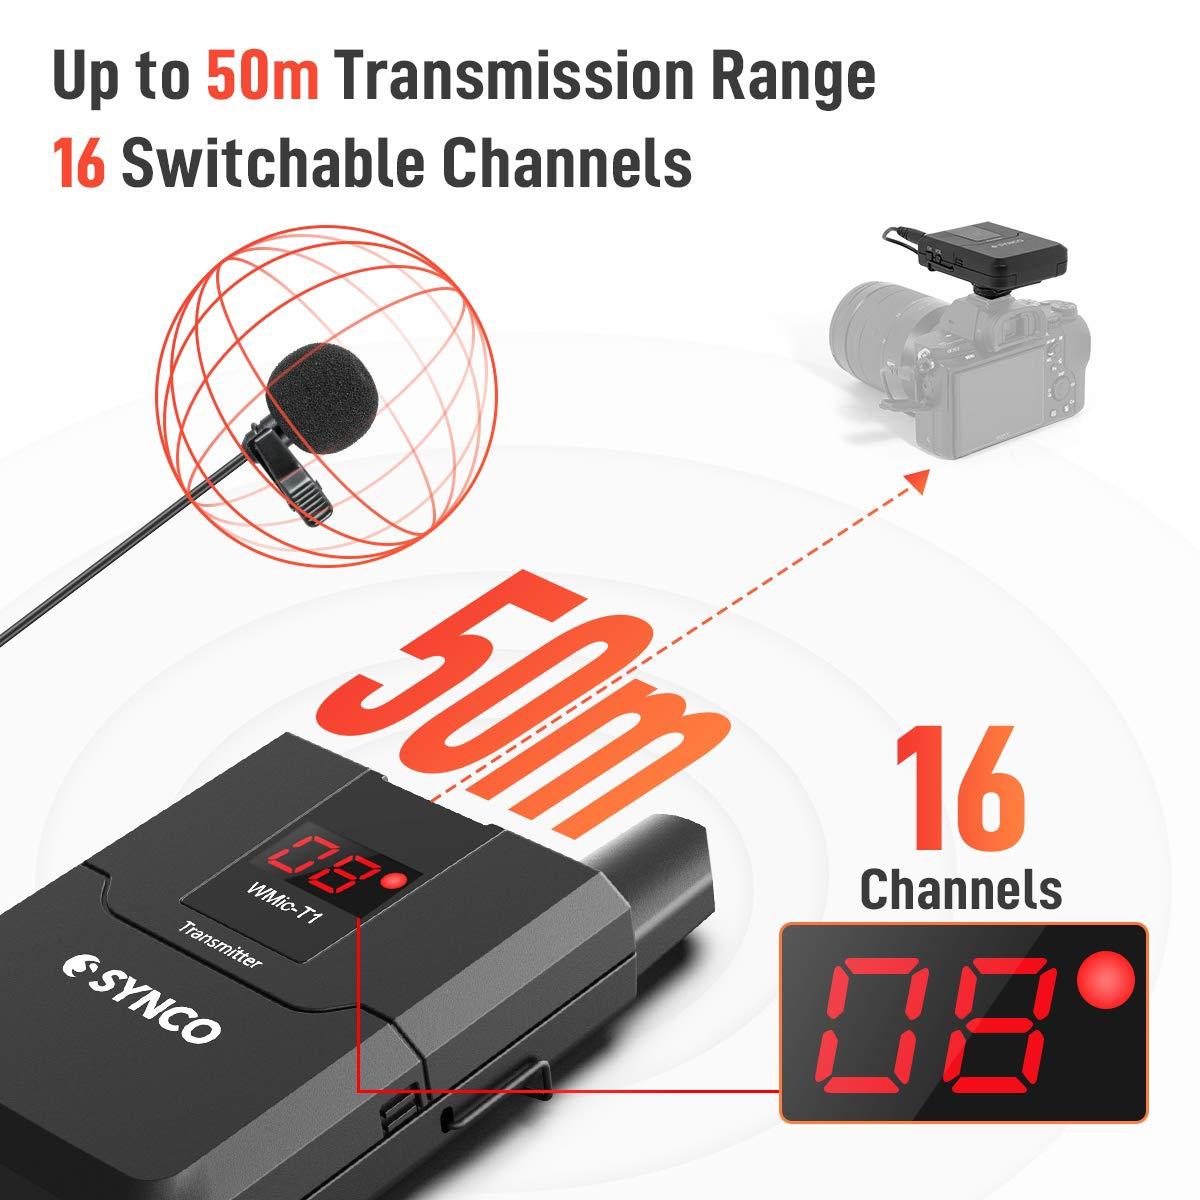 Adecuado para Entrevista Videoc/ámara y Smartphone SYNCO WMic T1 UHF-Micr/ófono-Solapa-Inal/ámbrico-Sistema 16 Canales para DSLR C/ámara Presentaci/ón etc Ense/ñanza 50m Rango de Transmisi/ón